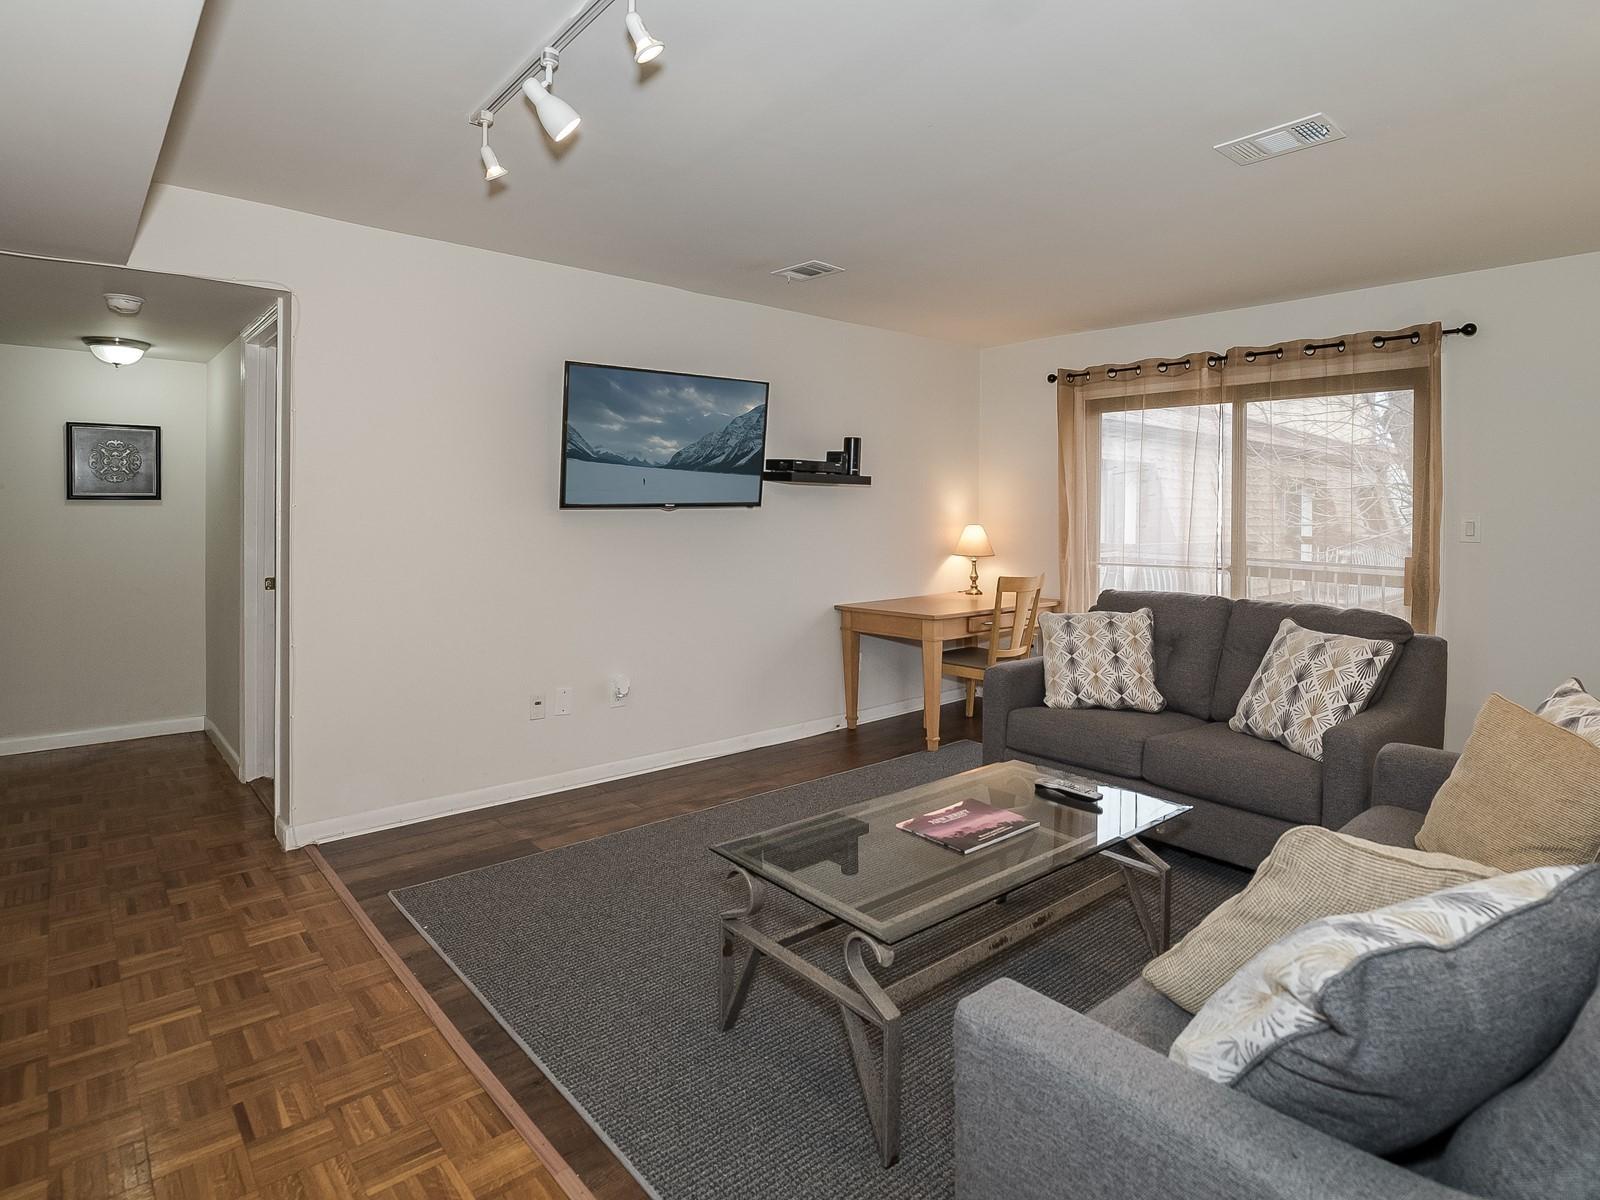 2_Furnished_Apartment_NorthBrunswickNJ_Living Room